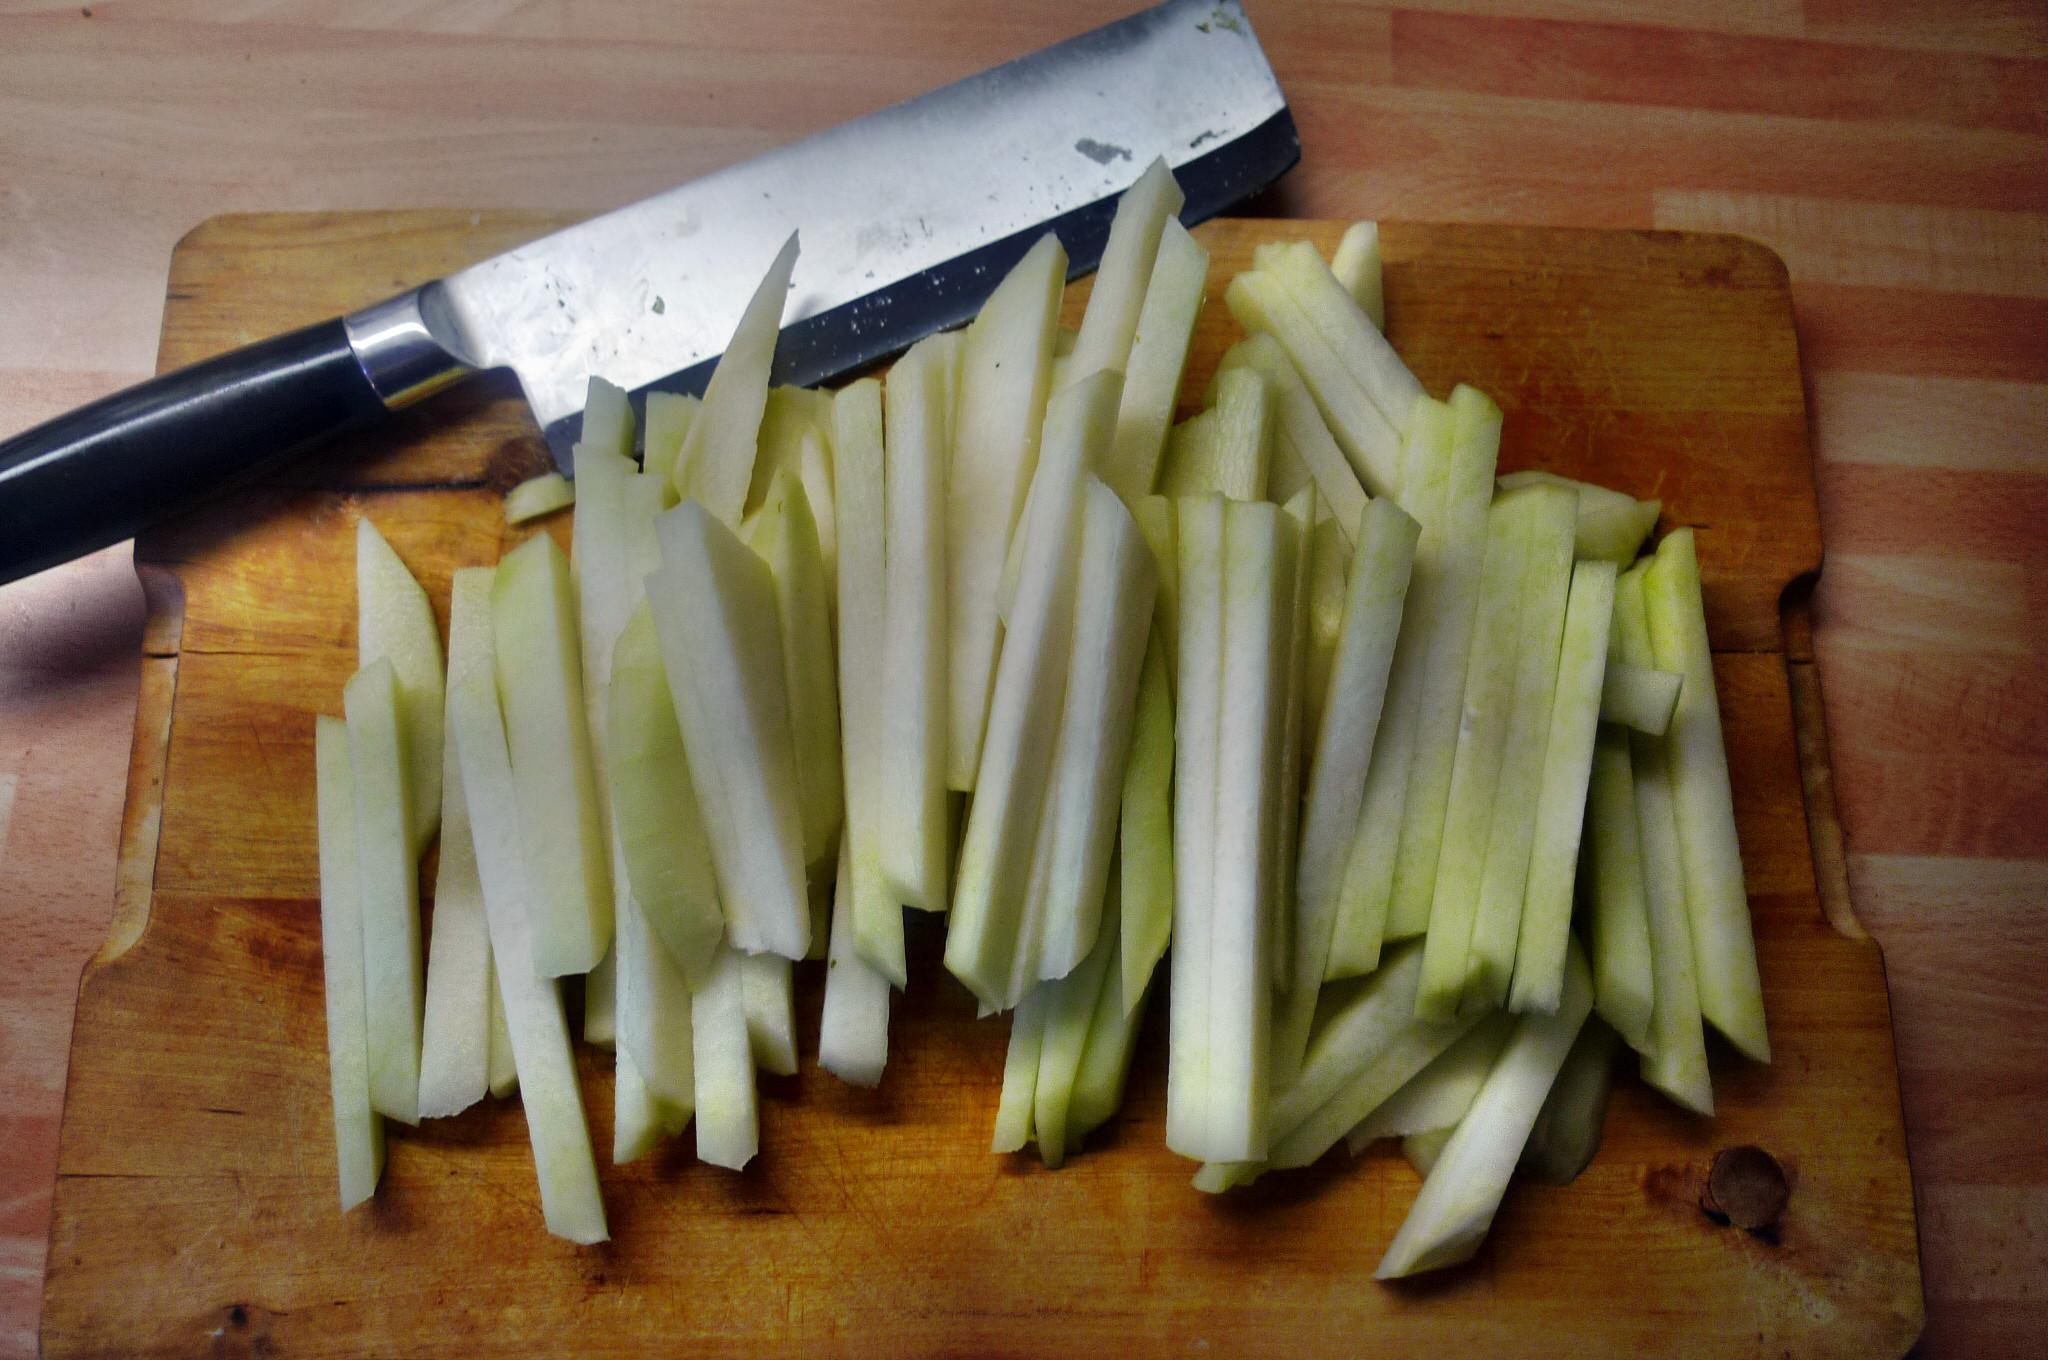 Selleriegemüse,Gurkensalat,Kartoffeln,Quarkspreise-19.3.15   (2)